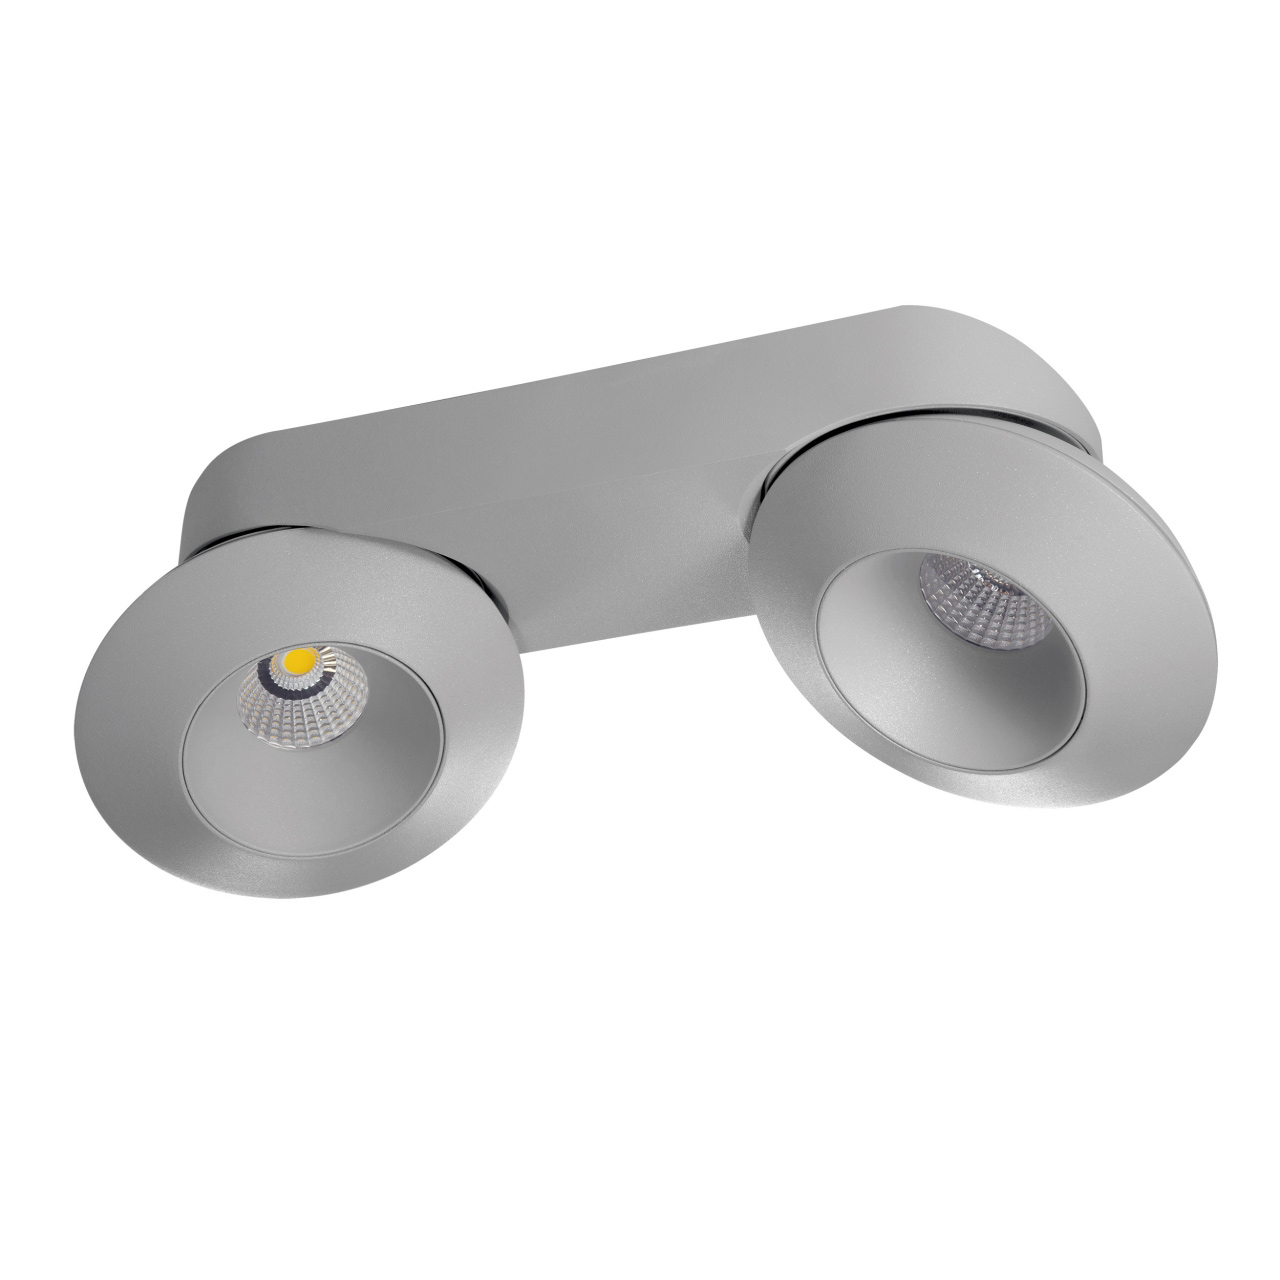 Светильник Orbe LED 32W 2480LM 60G серый 3000K Lightstar 051329